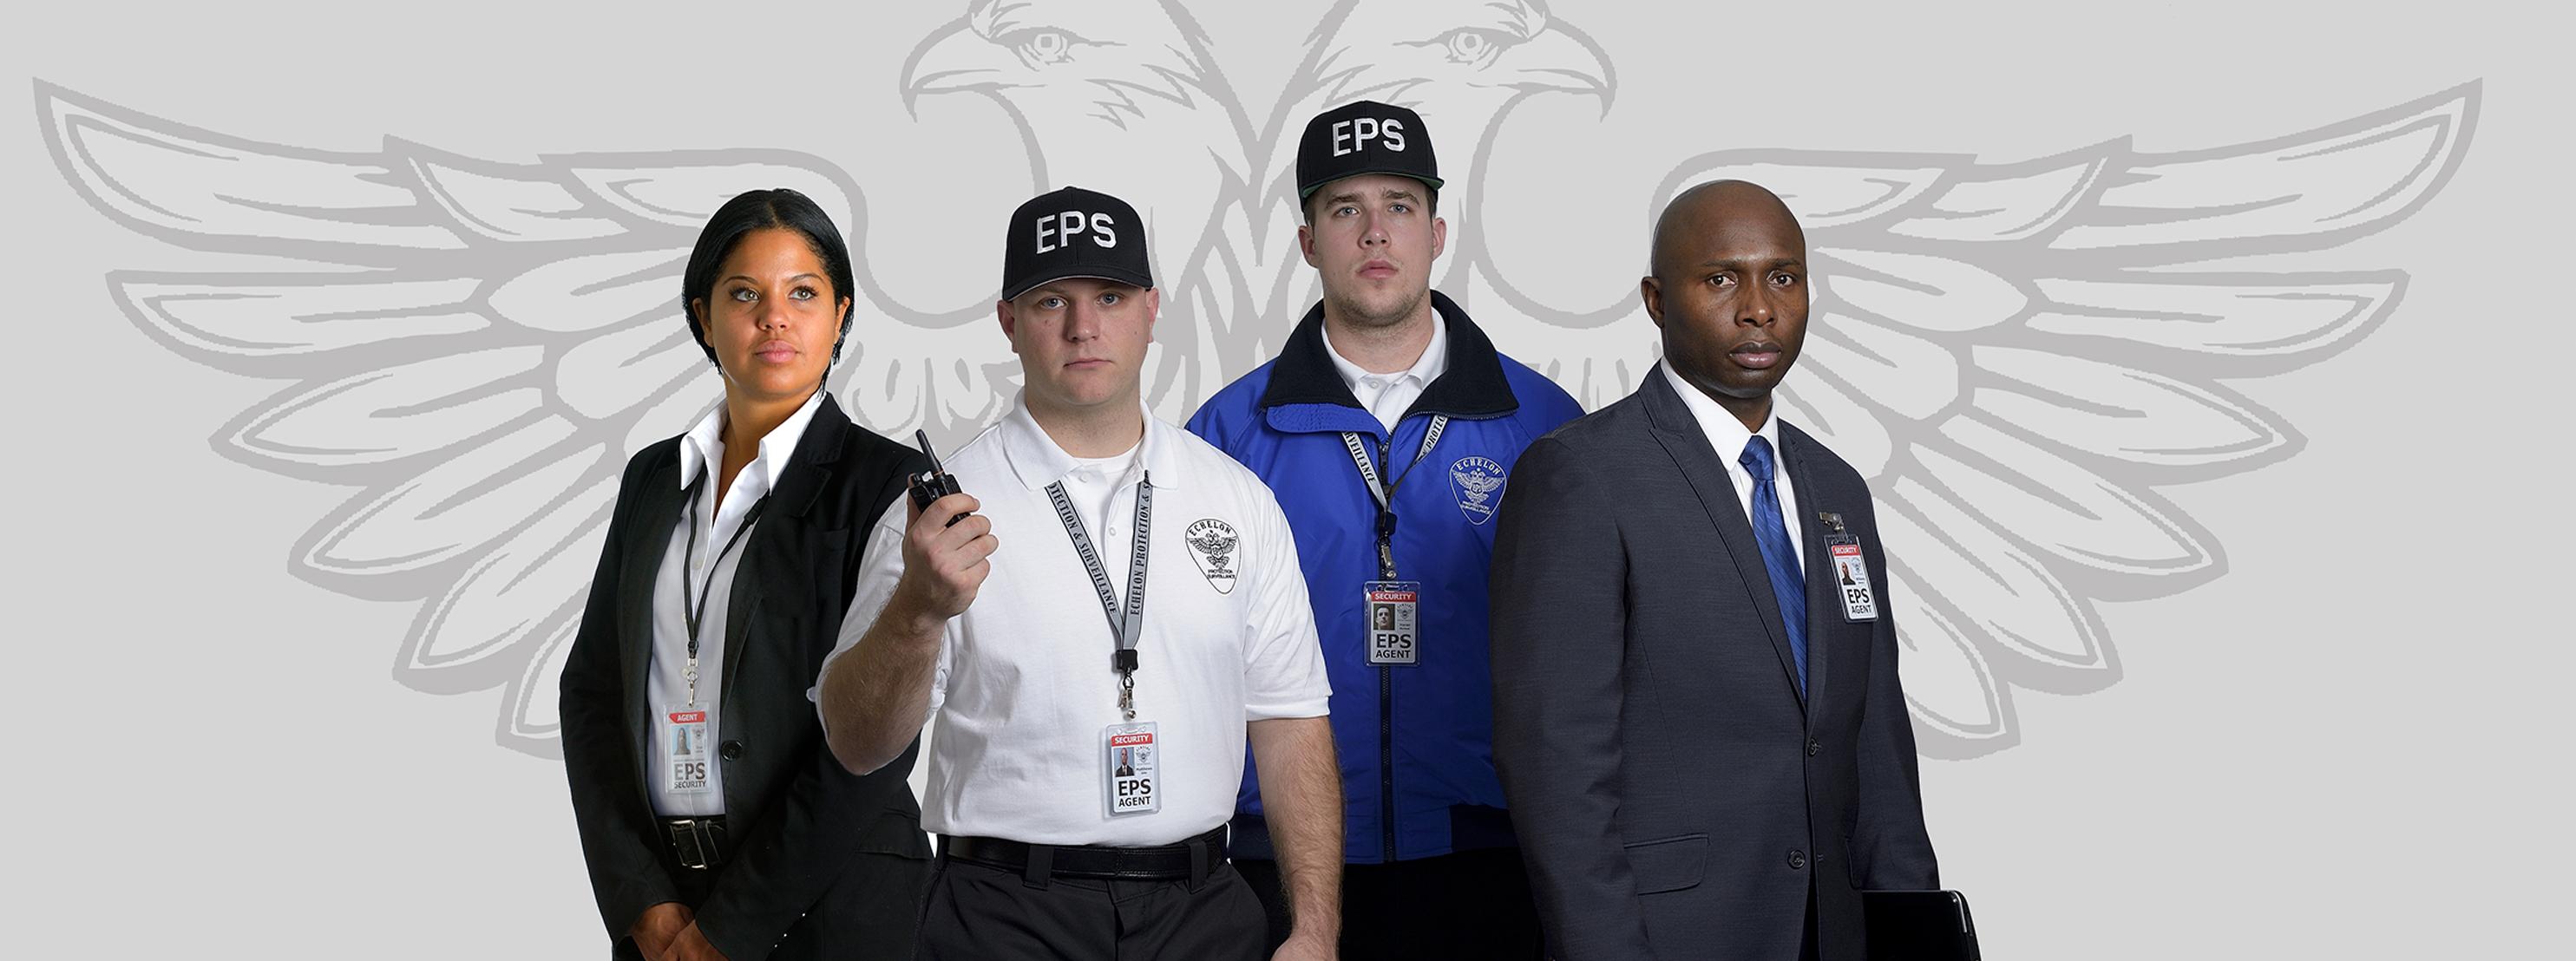 Vip Security Job Hiring